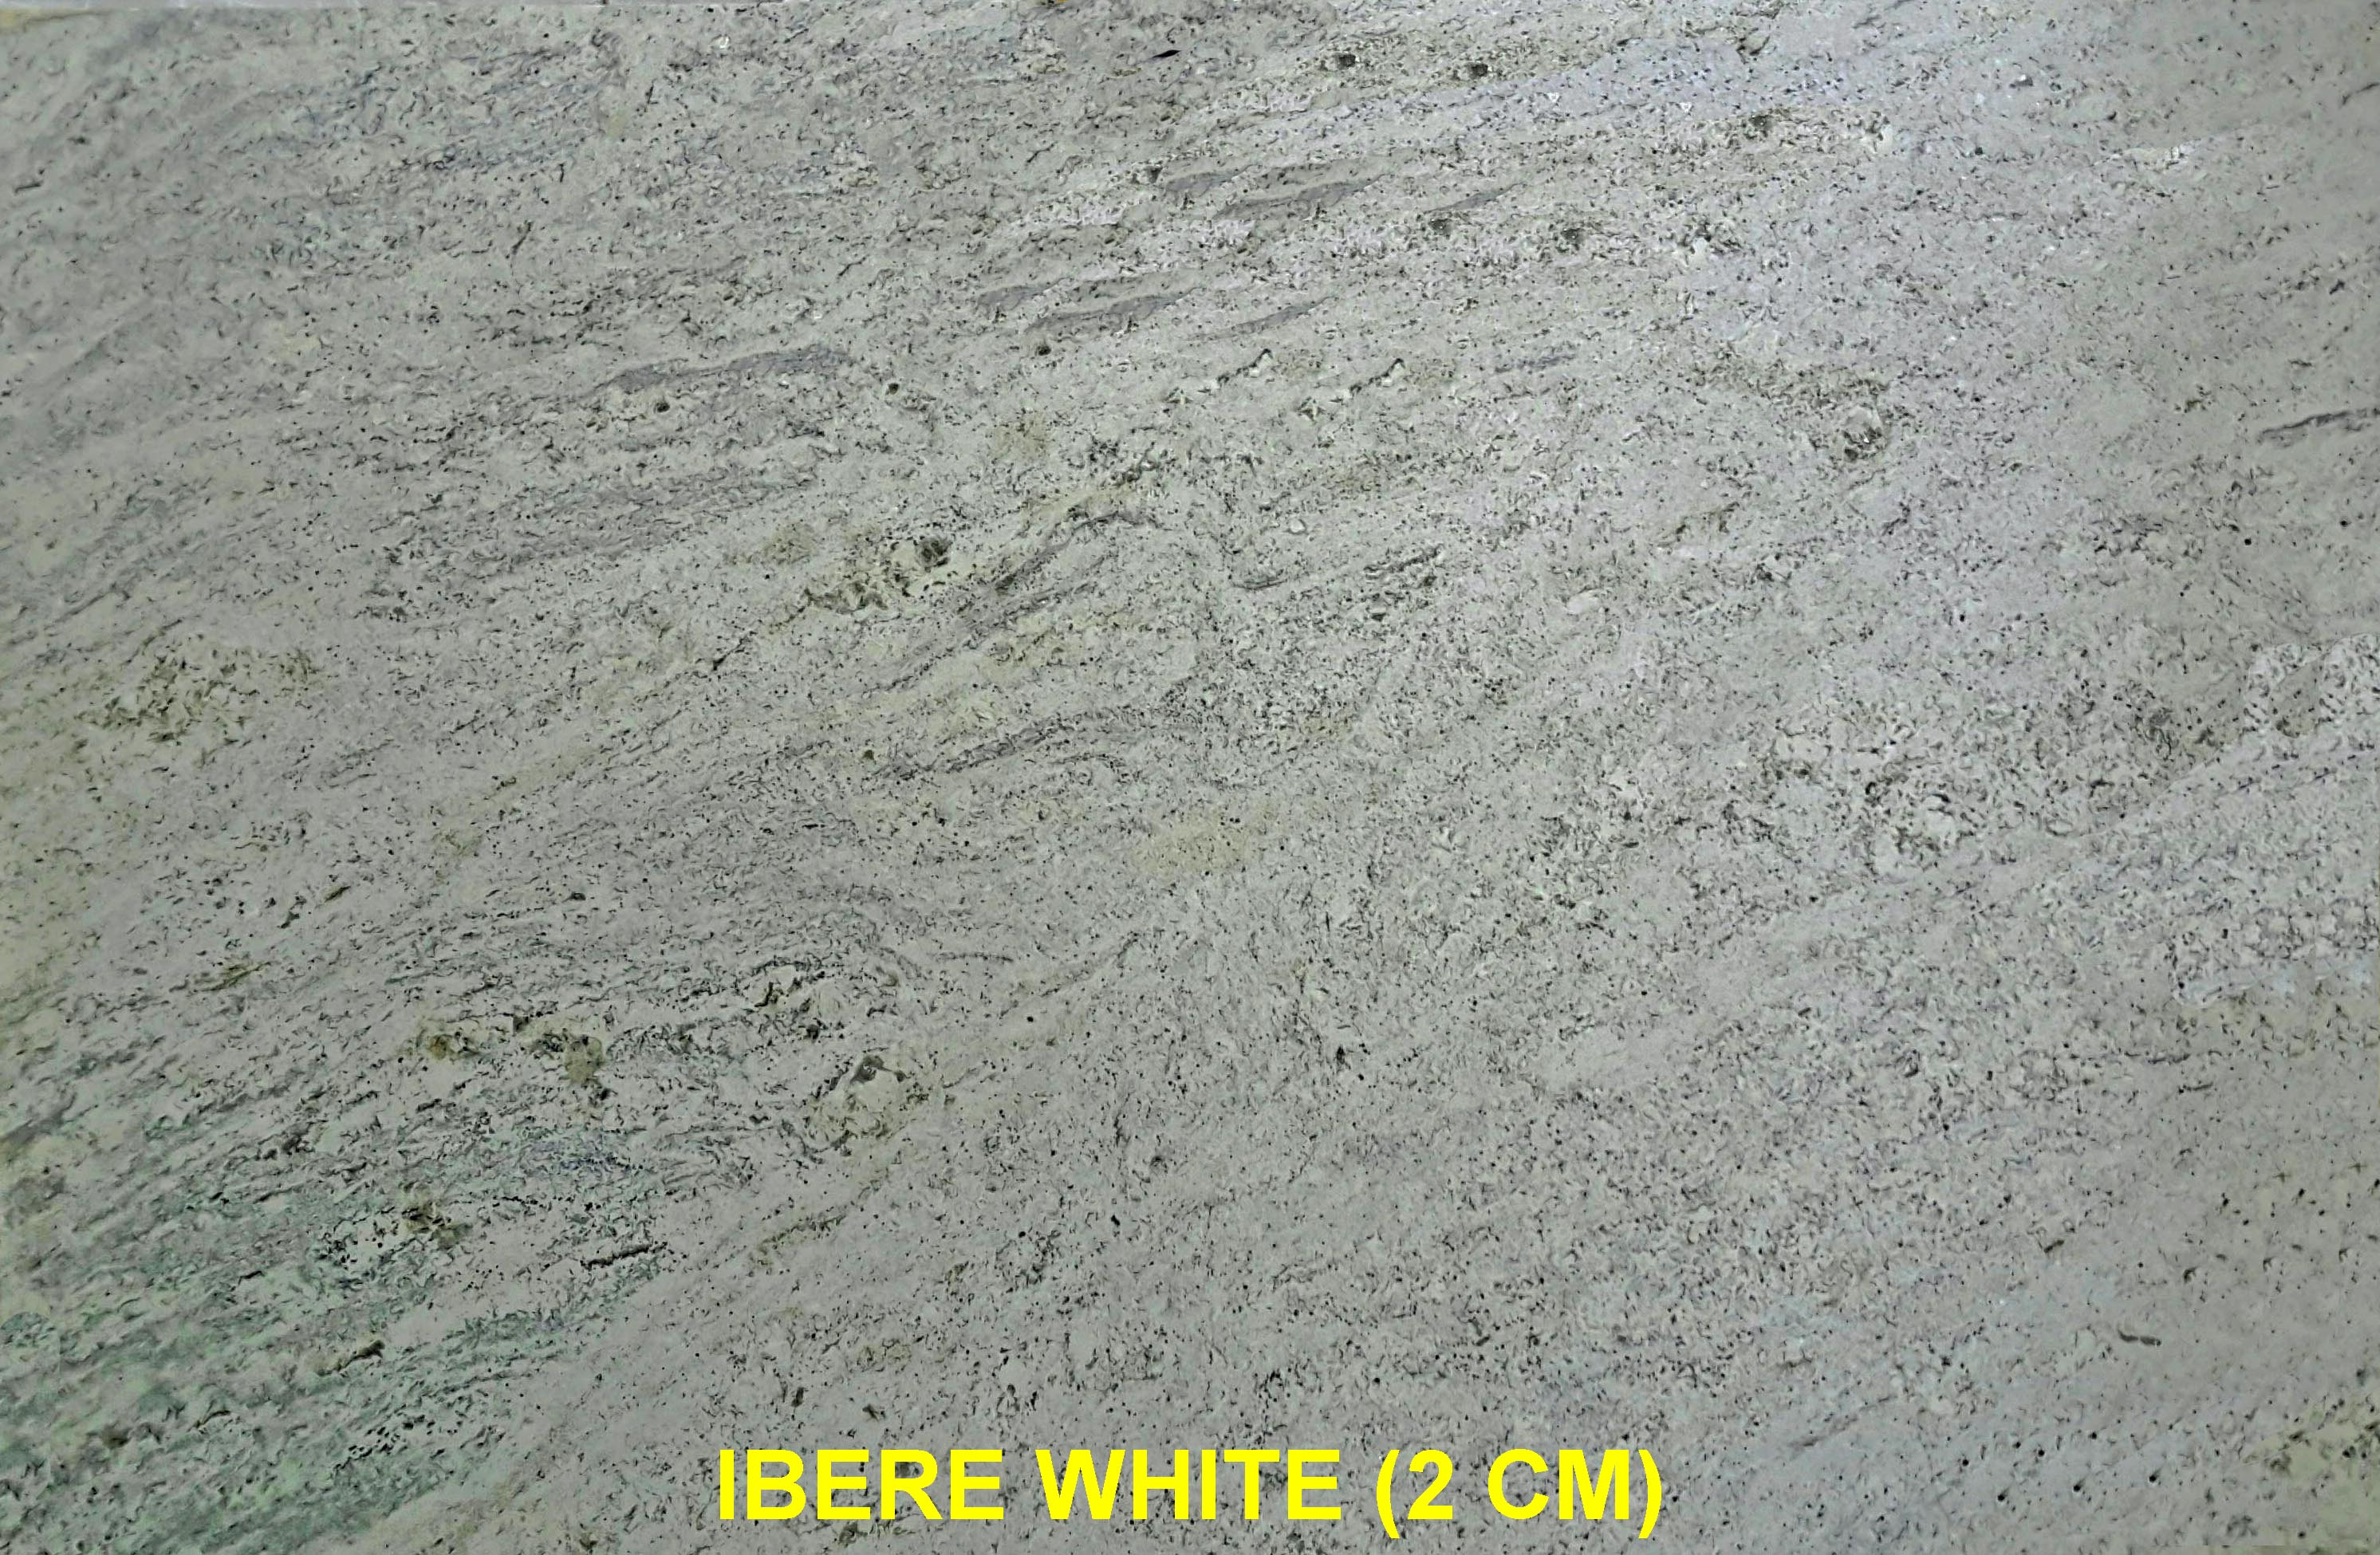 IBERE WHITE (3 CM)-2-#22352